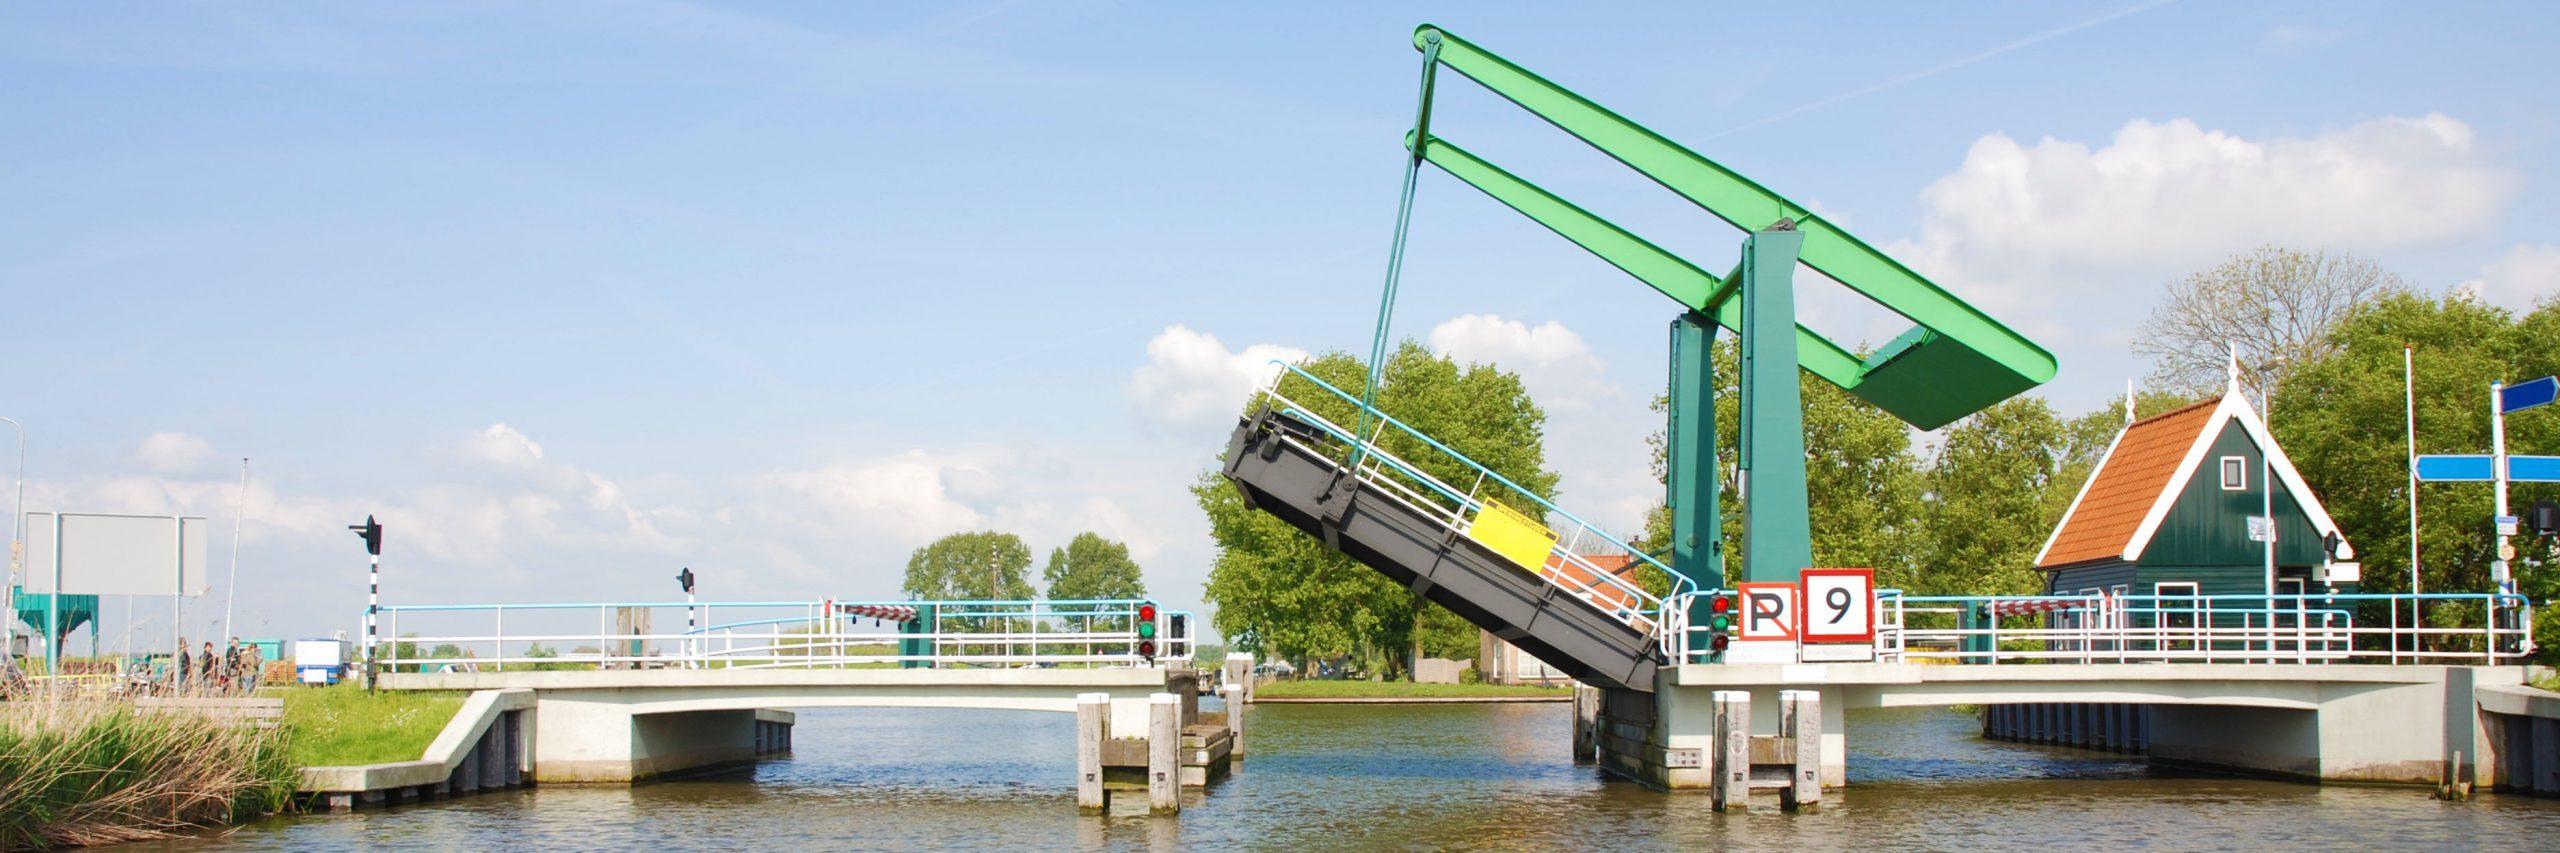 Products4Ships aluminum motor boat (flat bottom) 2 (1)